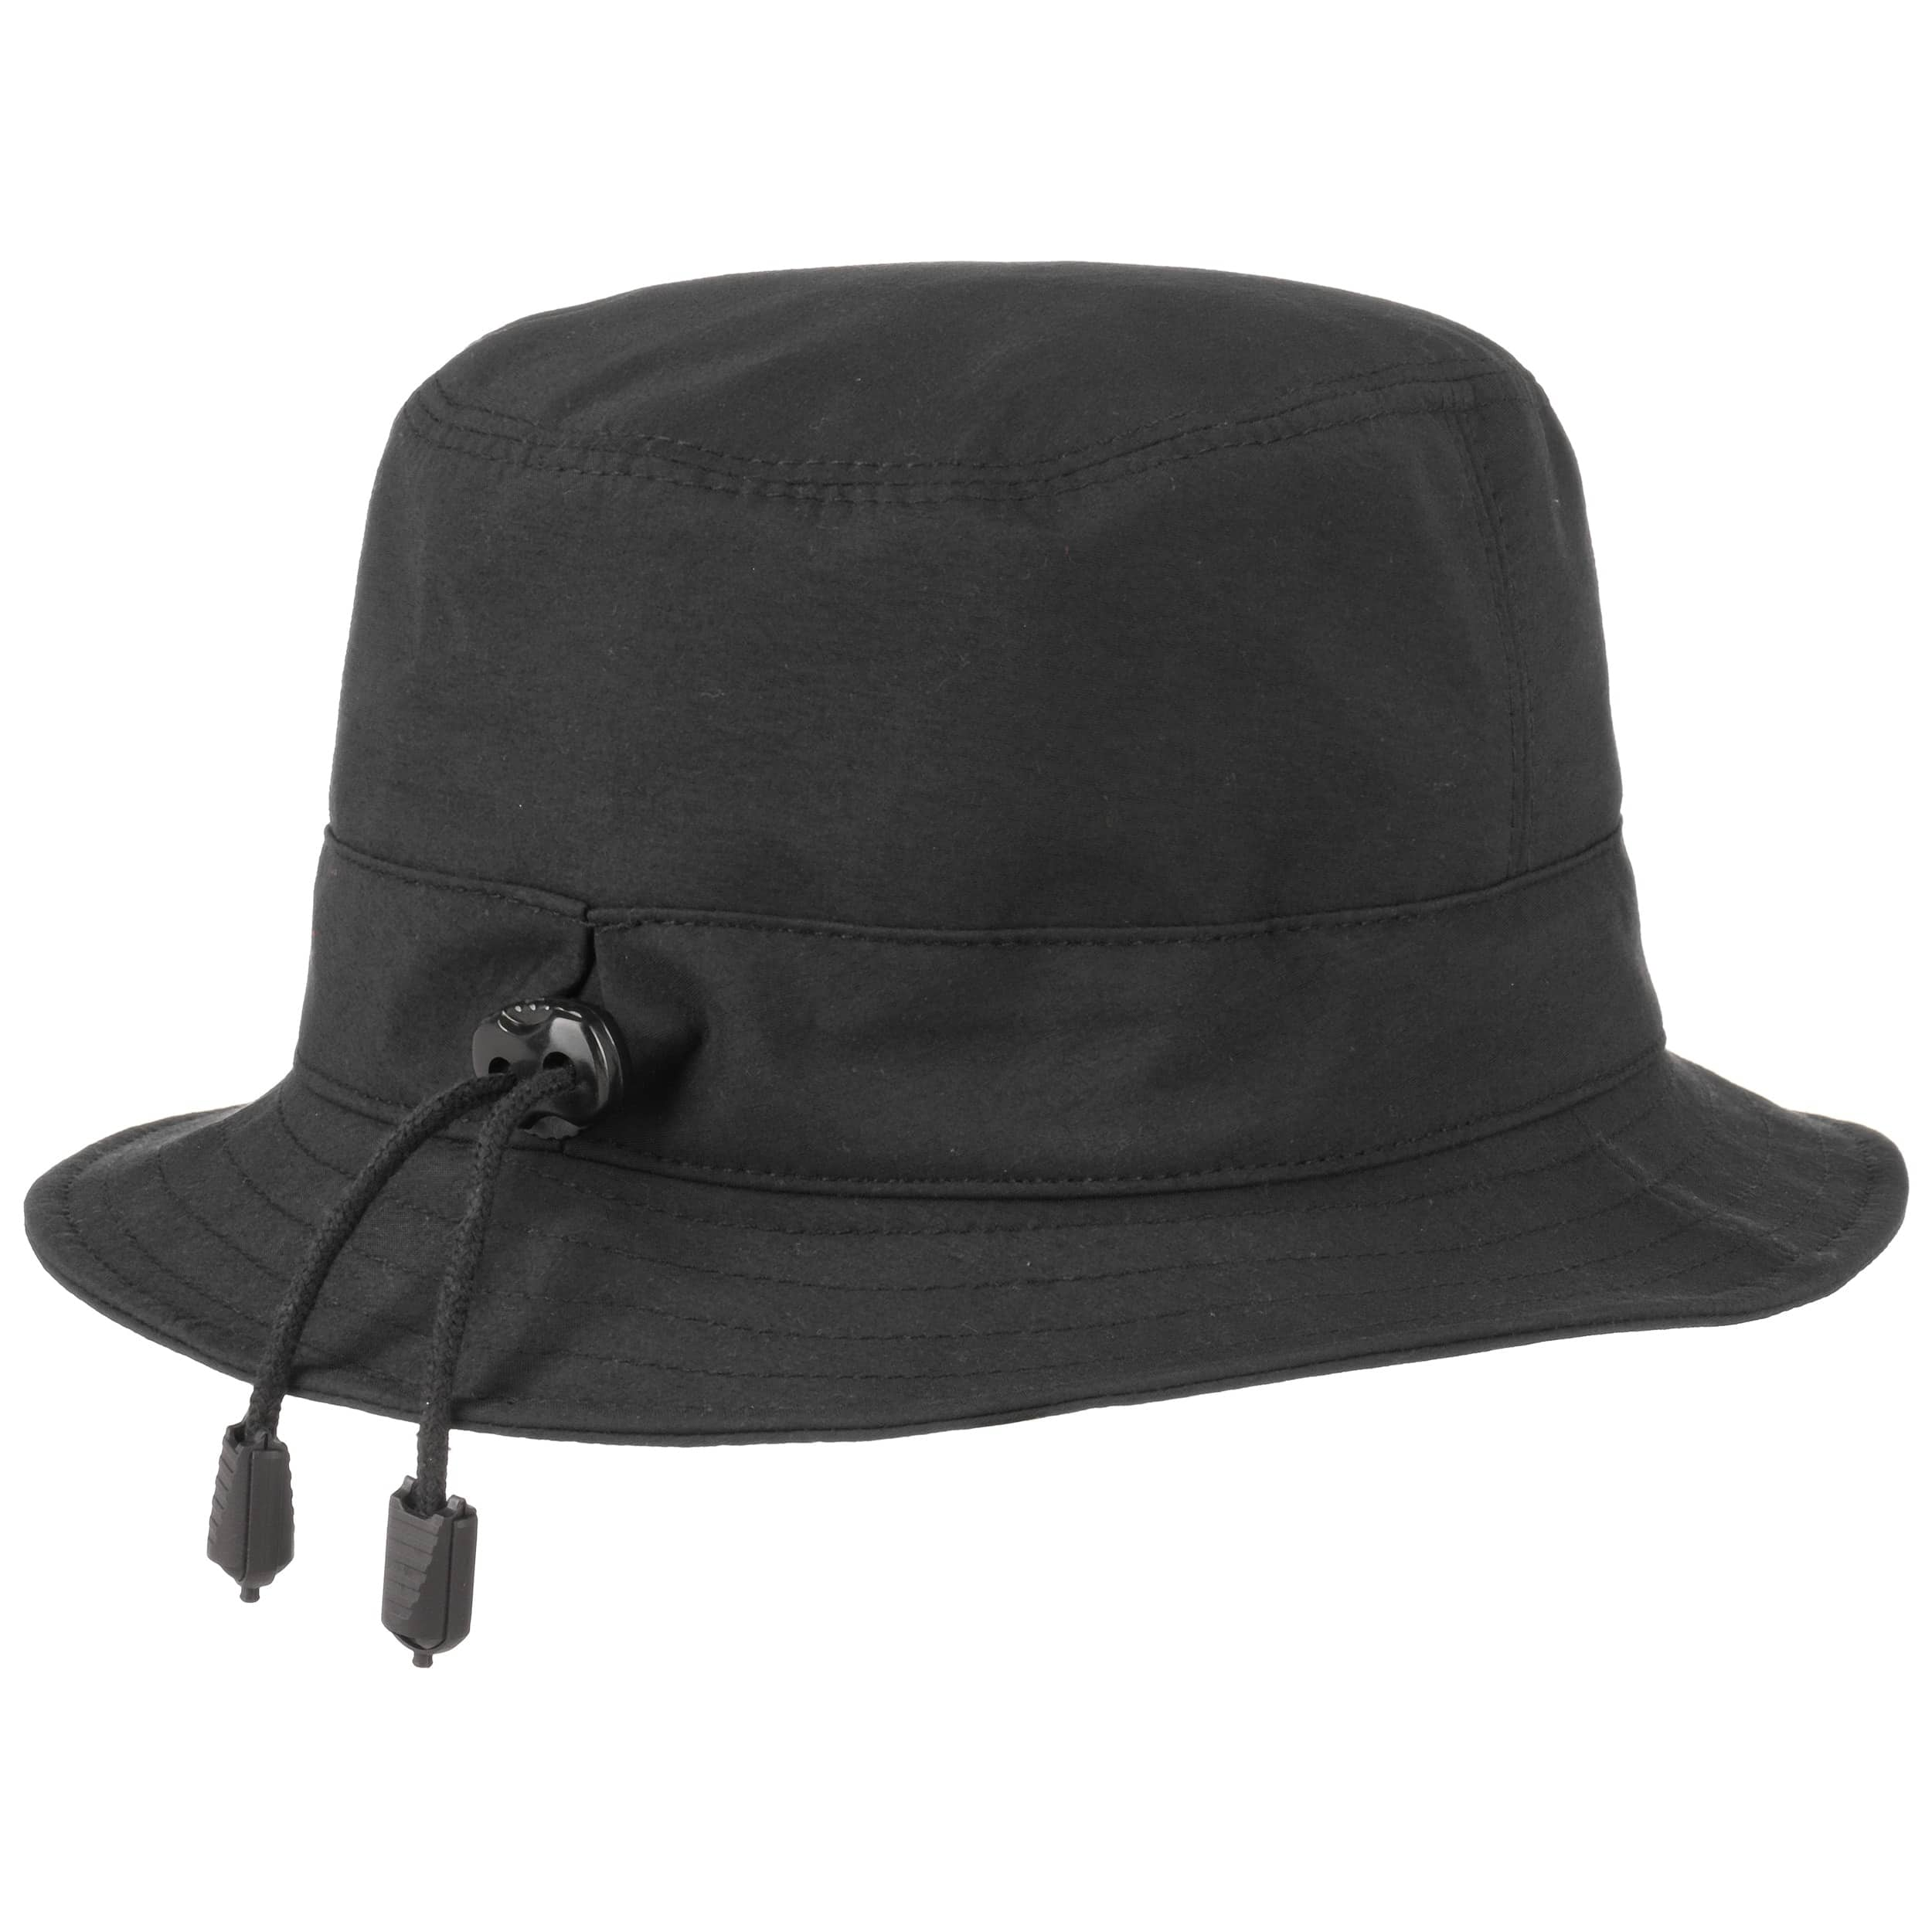 a25929a490949 ... Gore-Tex Light Rain Hat by Lierys - black 2 ...